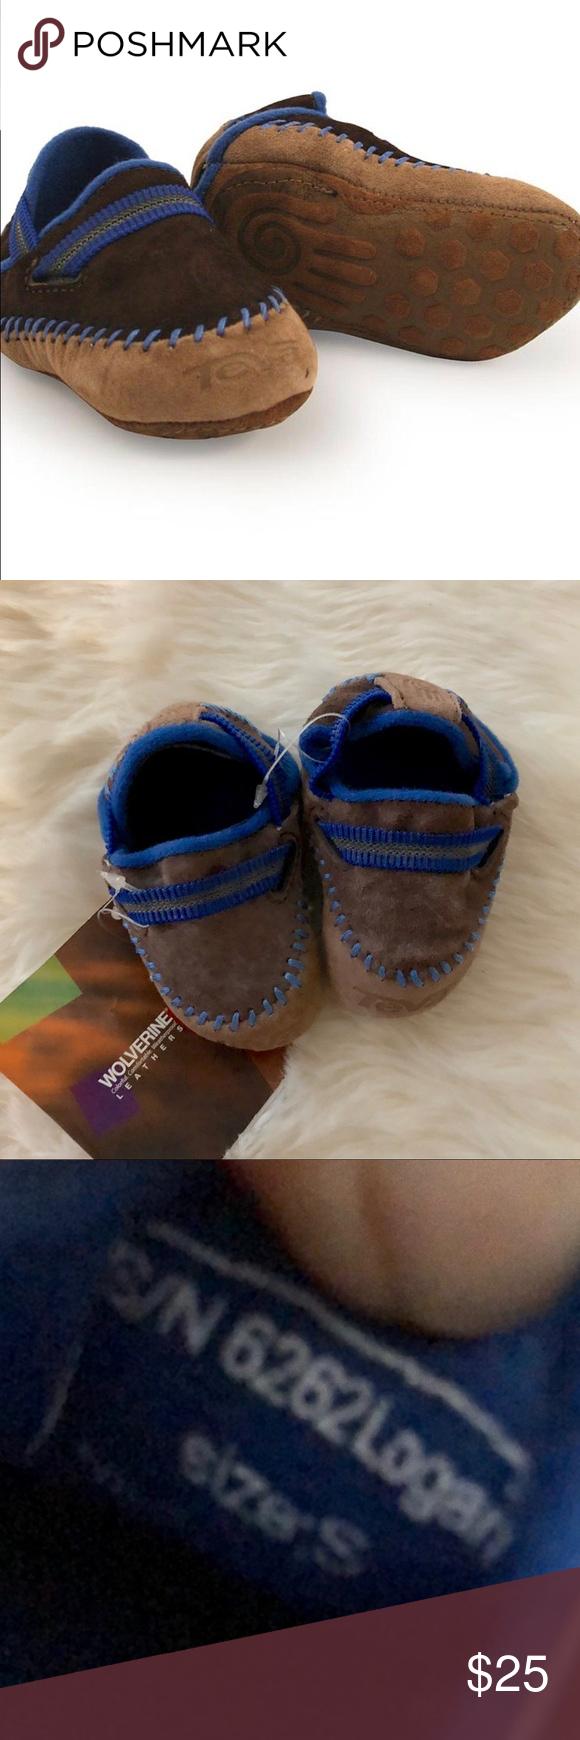 1823ad33724f NWT Teva Infant Logan Crib Shoe  sz S (0-6M) Itty bitty